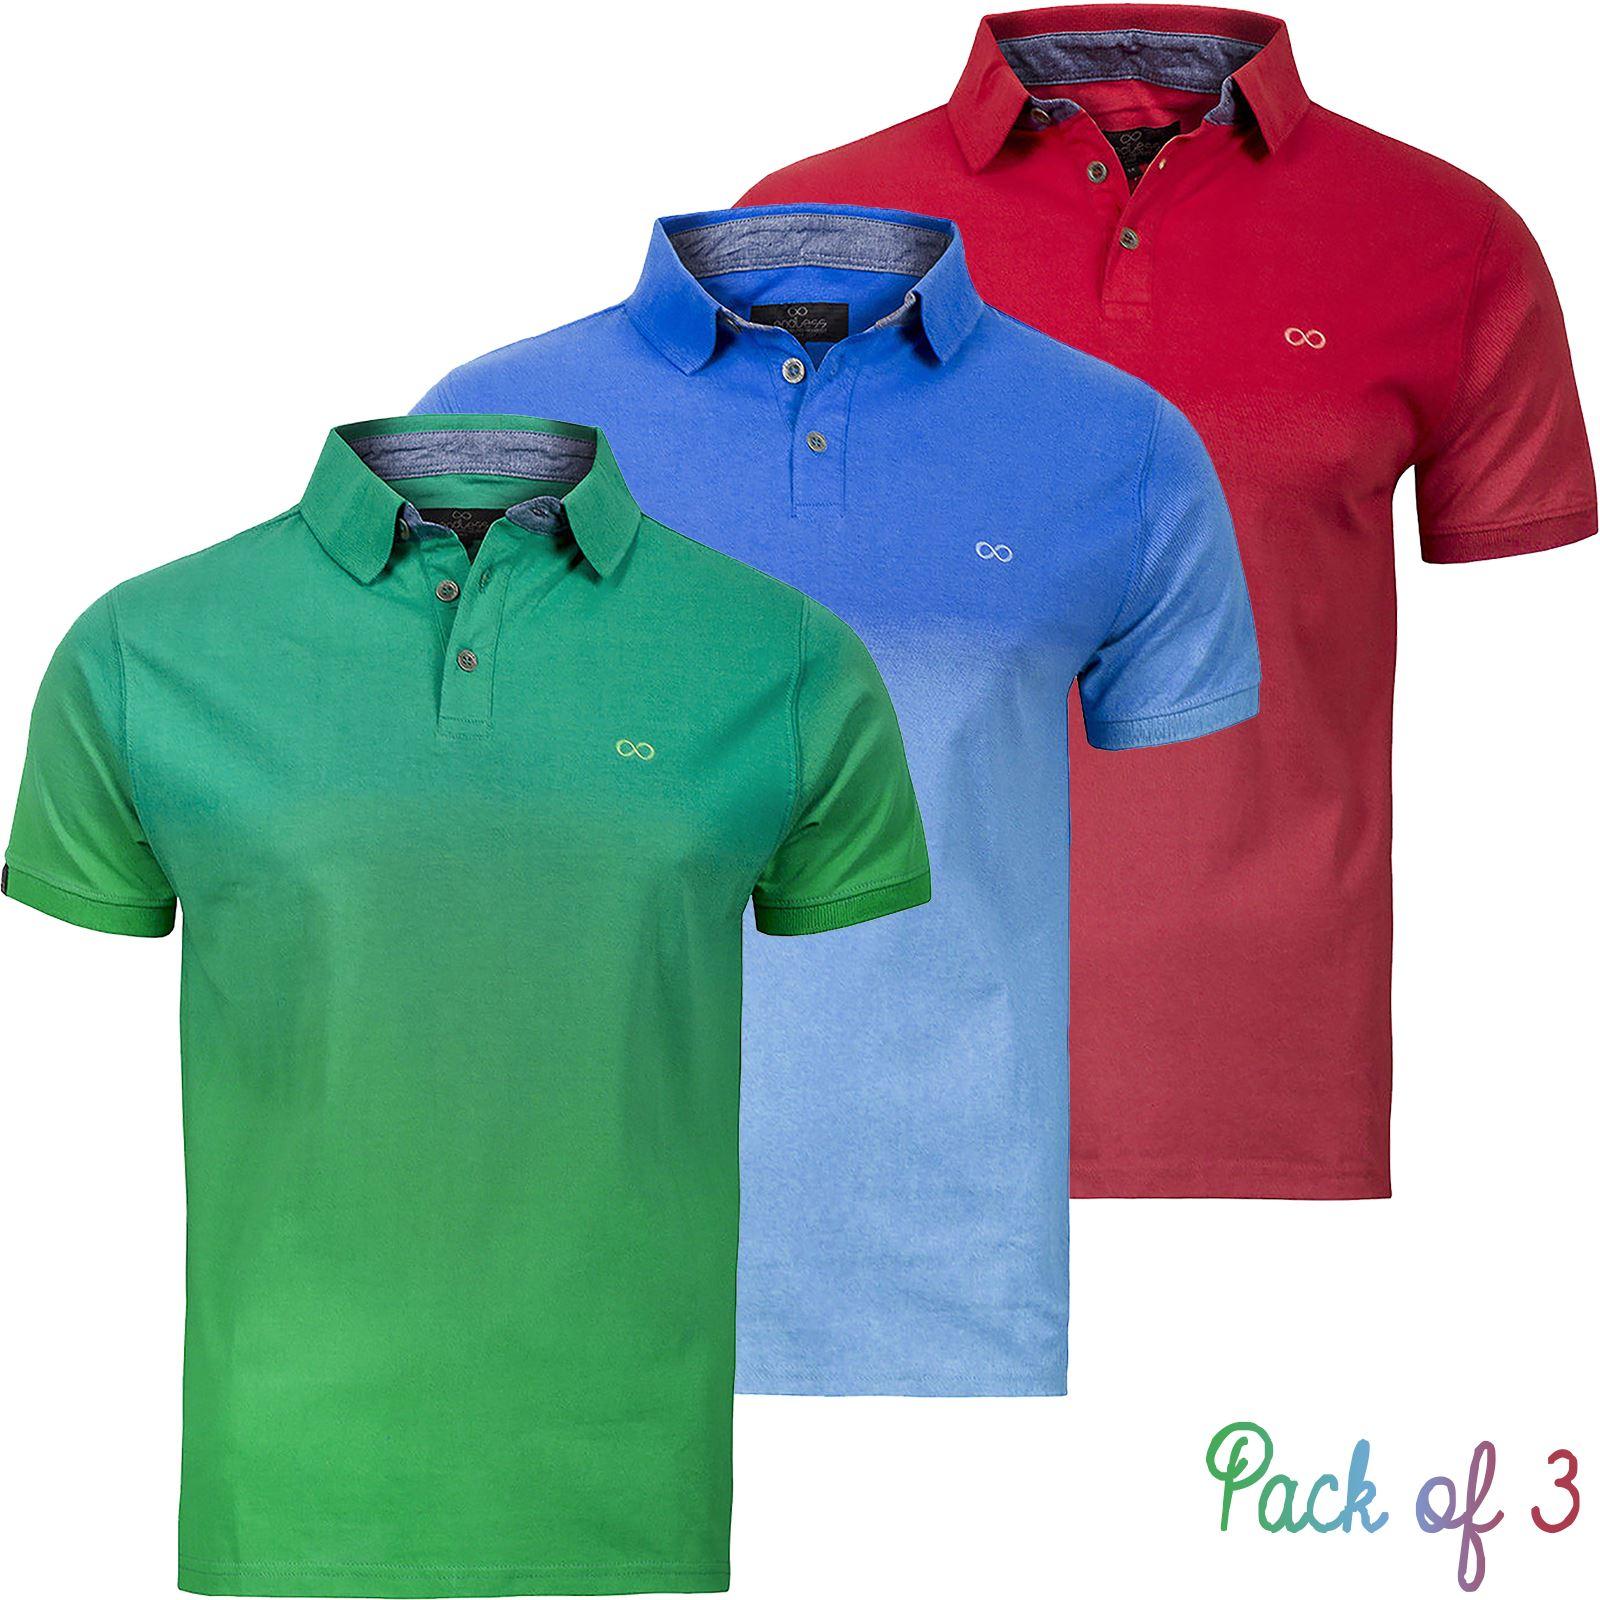 New mens pack of 3 polo shirts multi 3pack endless dip dye for Mens dip dye shirt